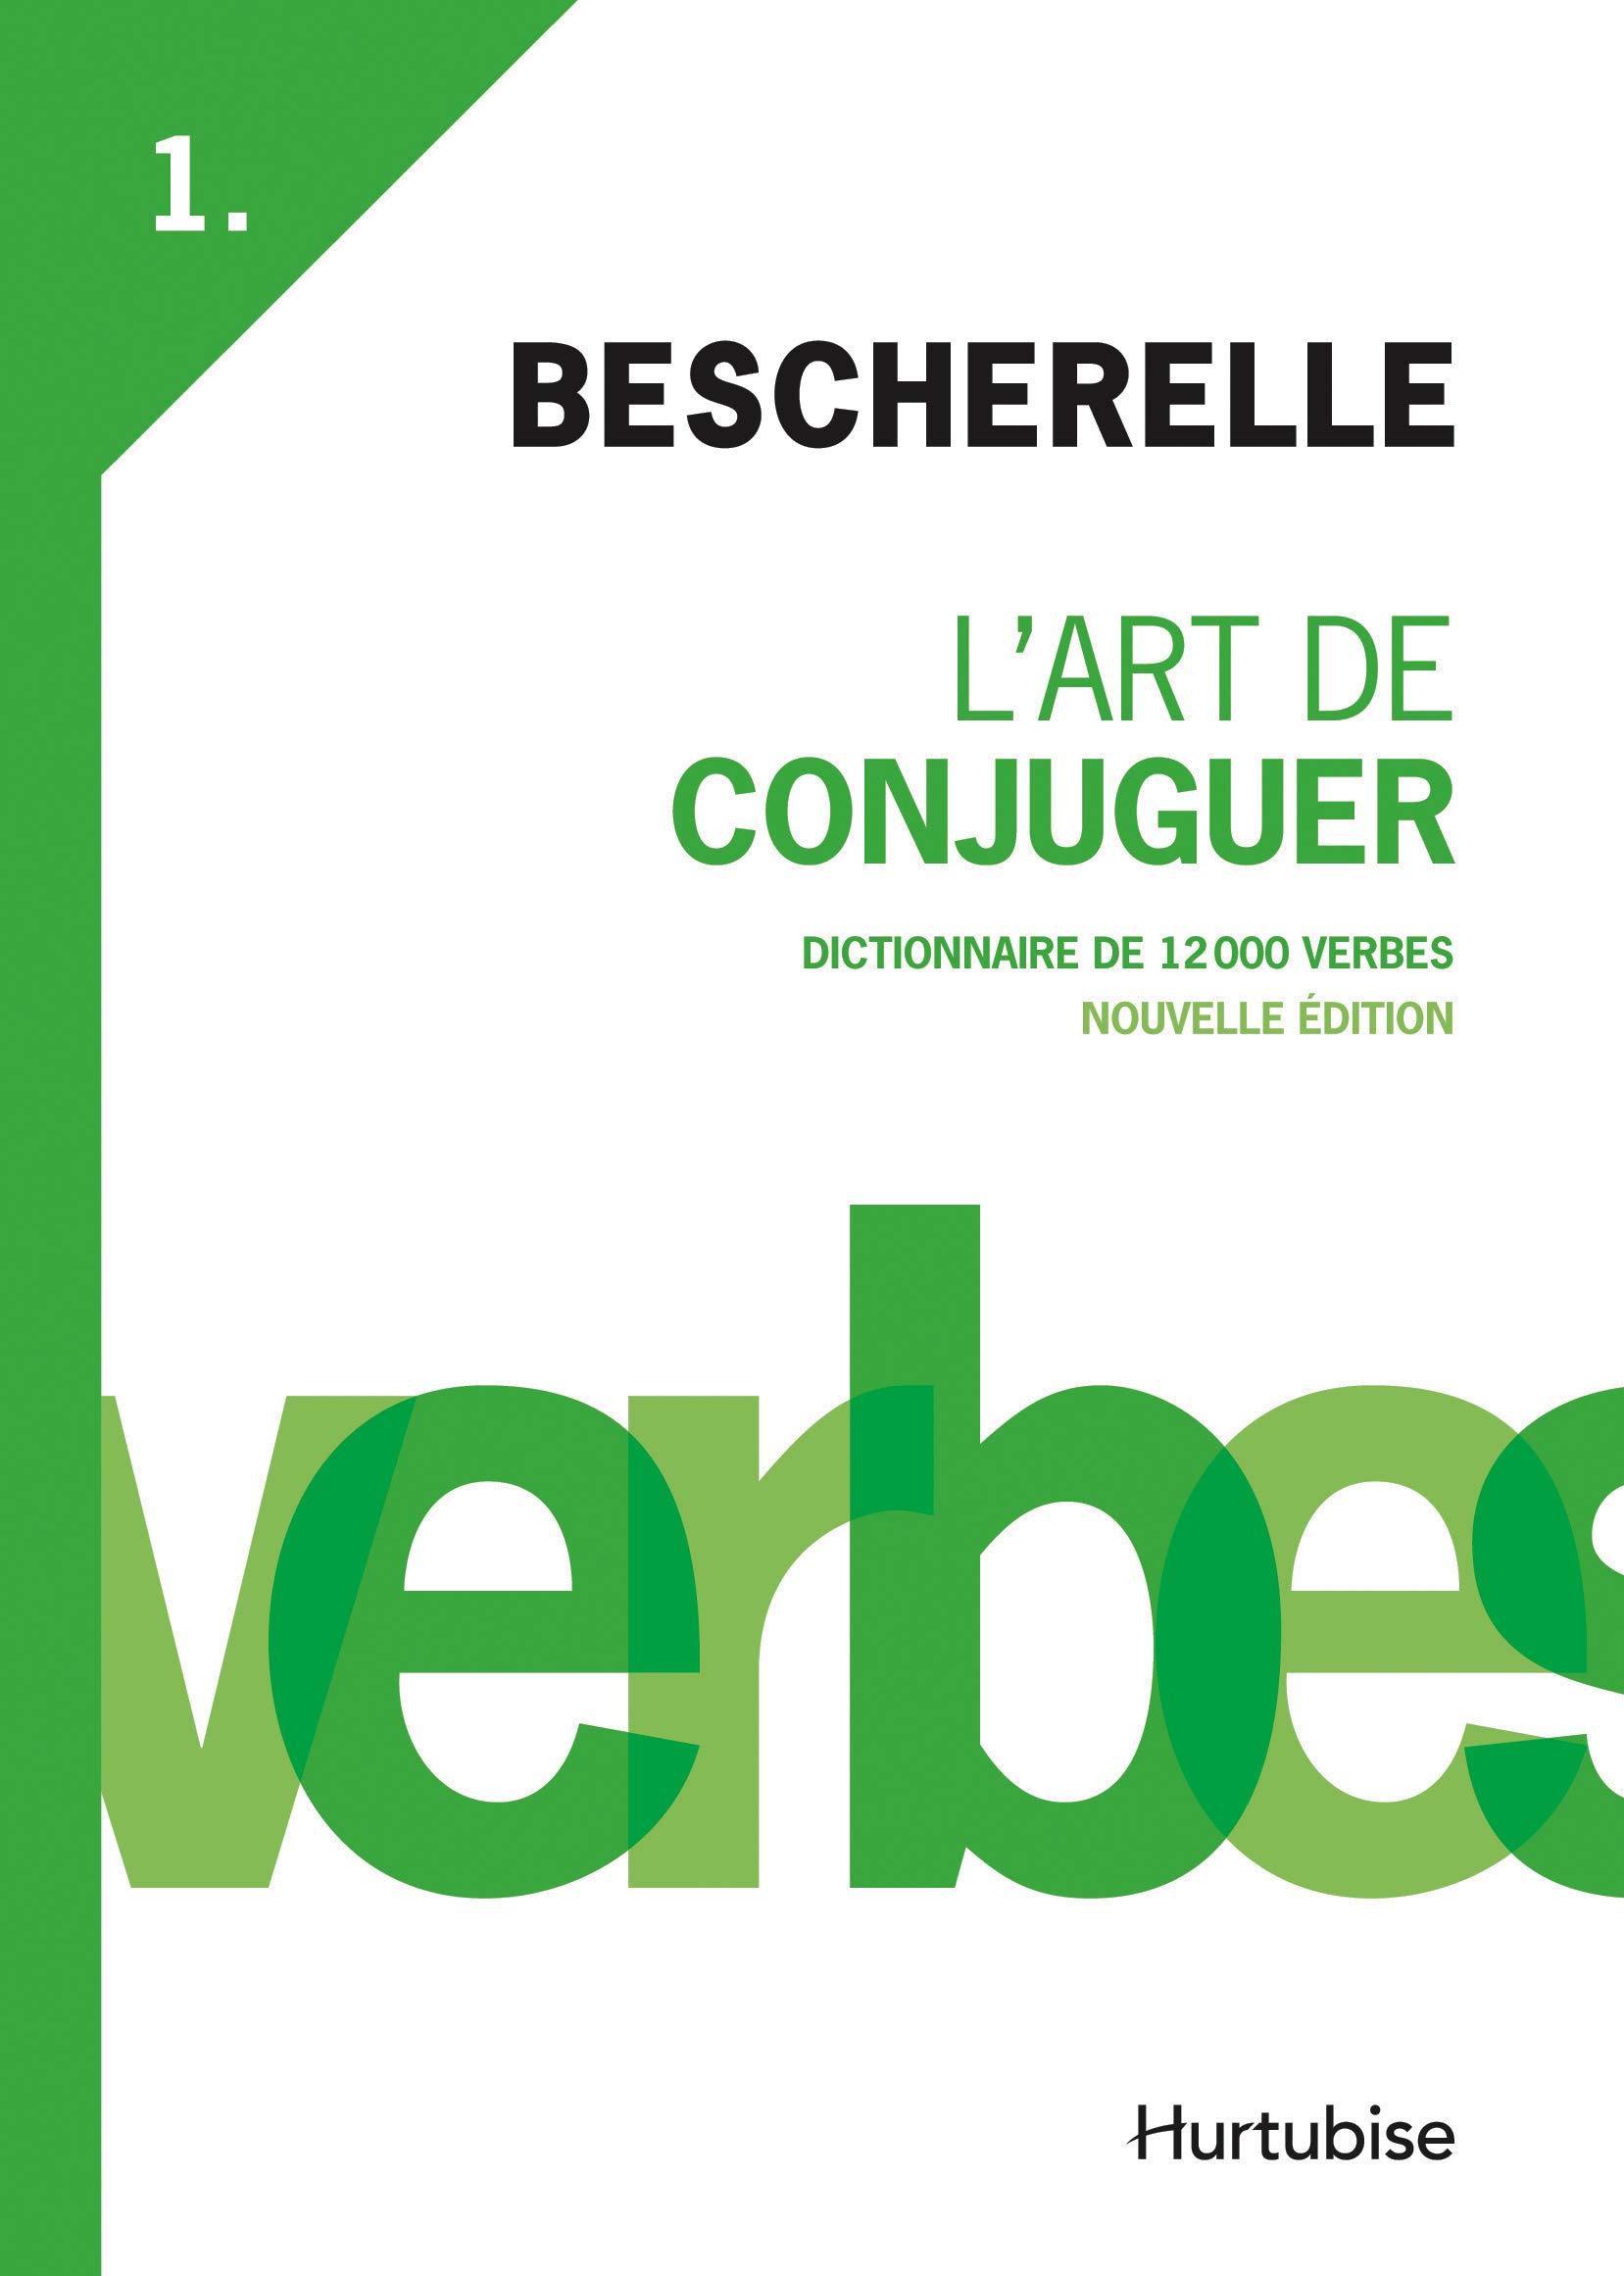 Buy L Art De Conjuguer Bescherelle Book Online At Low Prices In India L Art De Conjuguer Bescherelle Reviews Ratings Amazon In